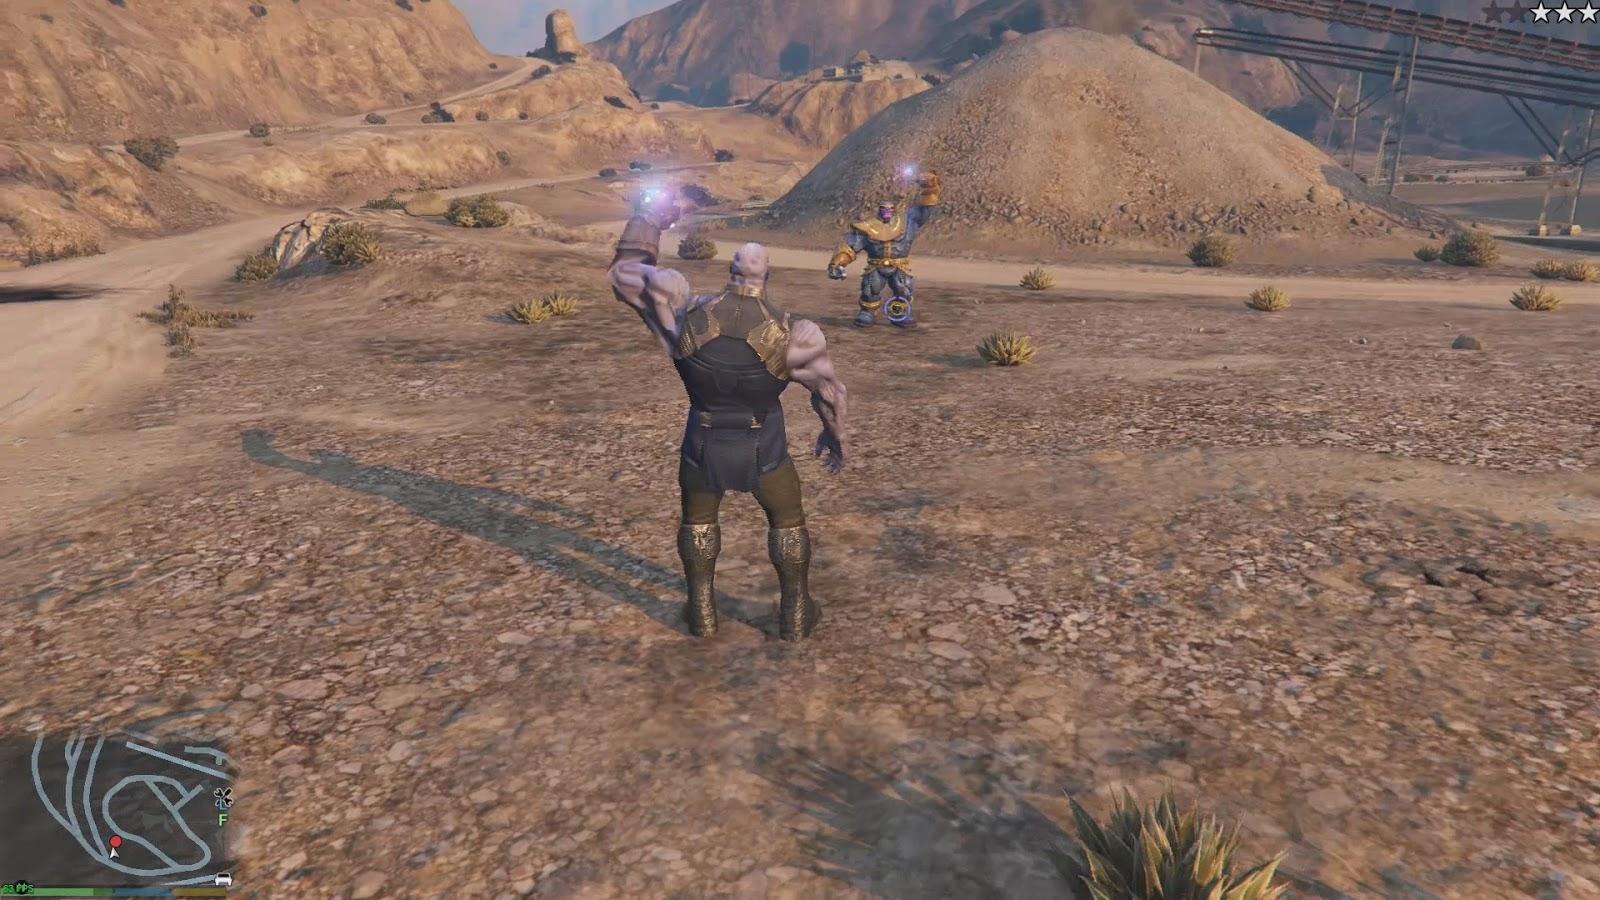 Download GTA V Thanos Mod